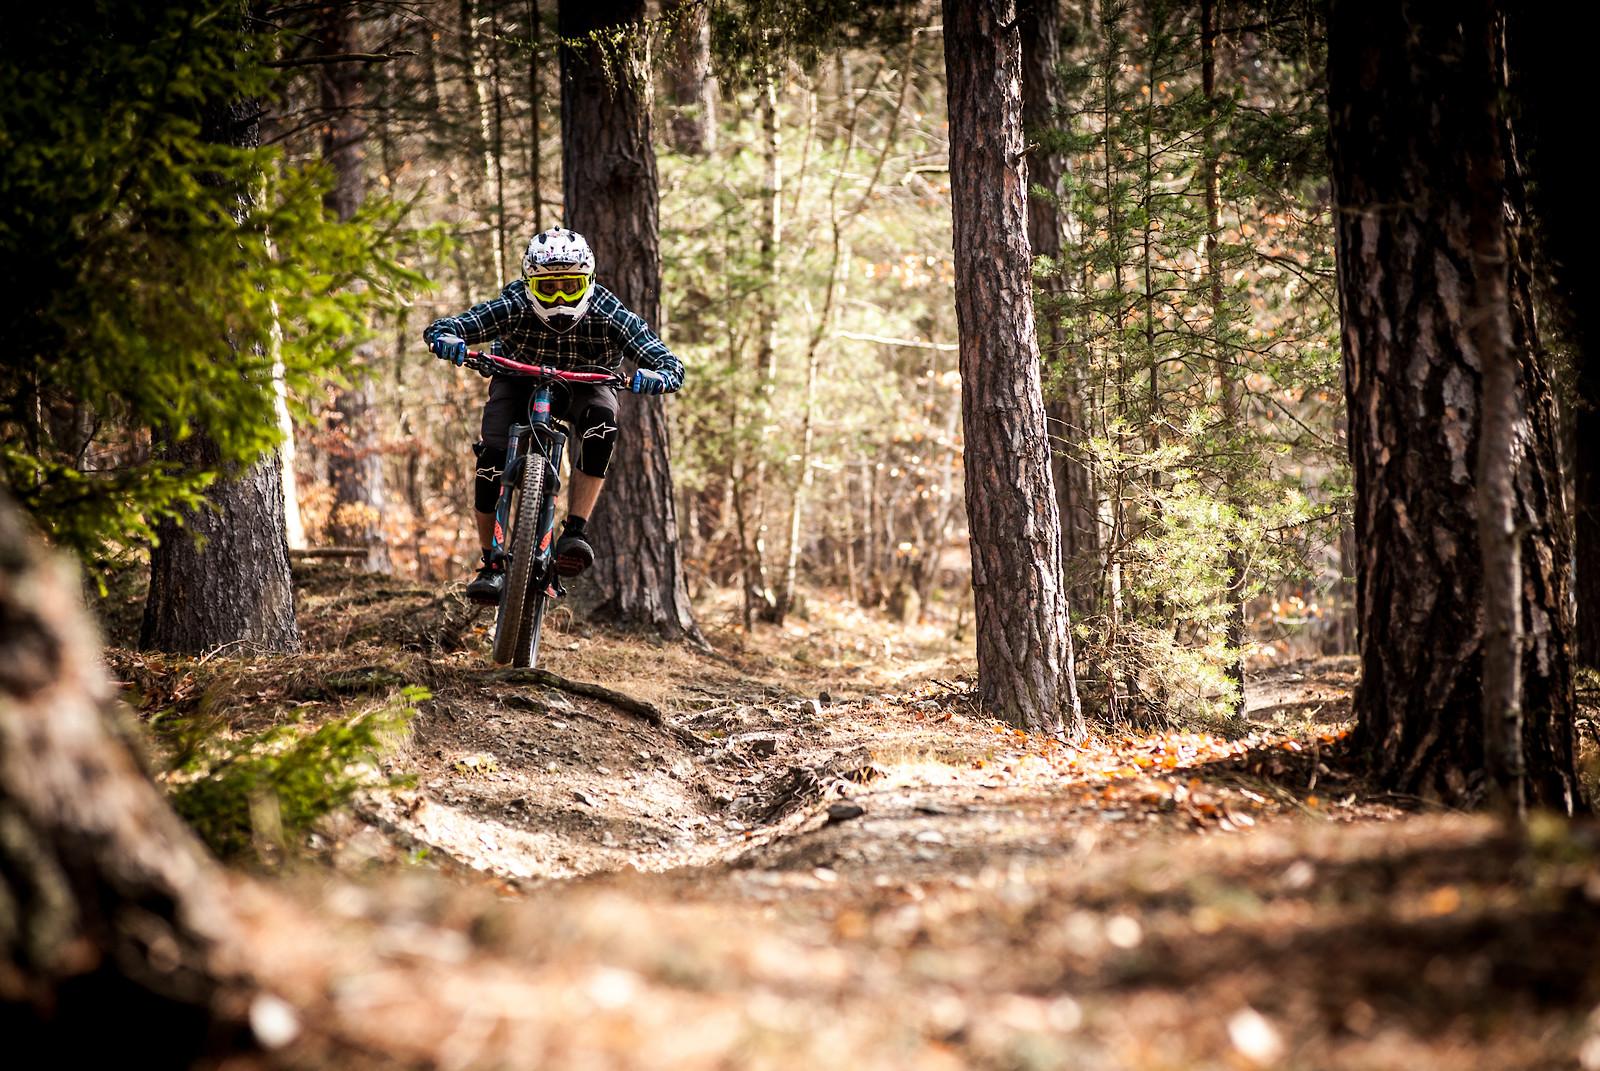 krompachy2019 (3 of 57) - purehell - Mountain Biking Pictures - Vital MTB